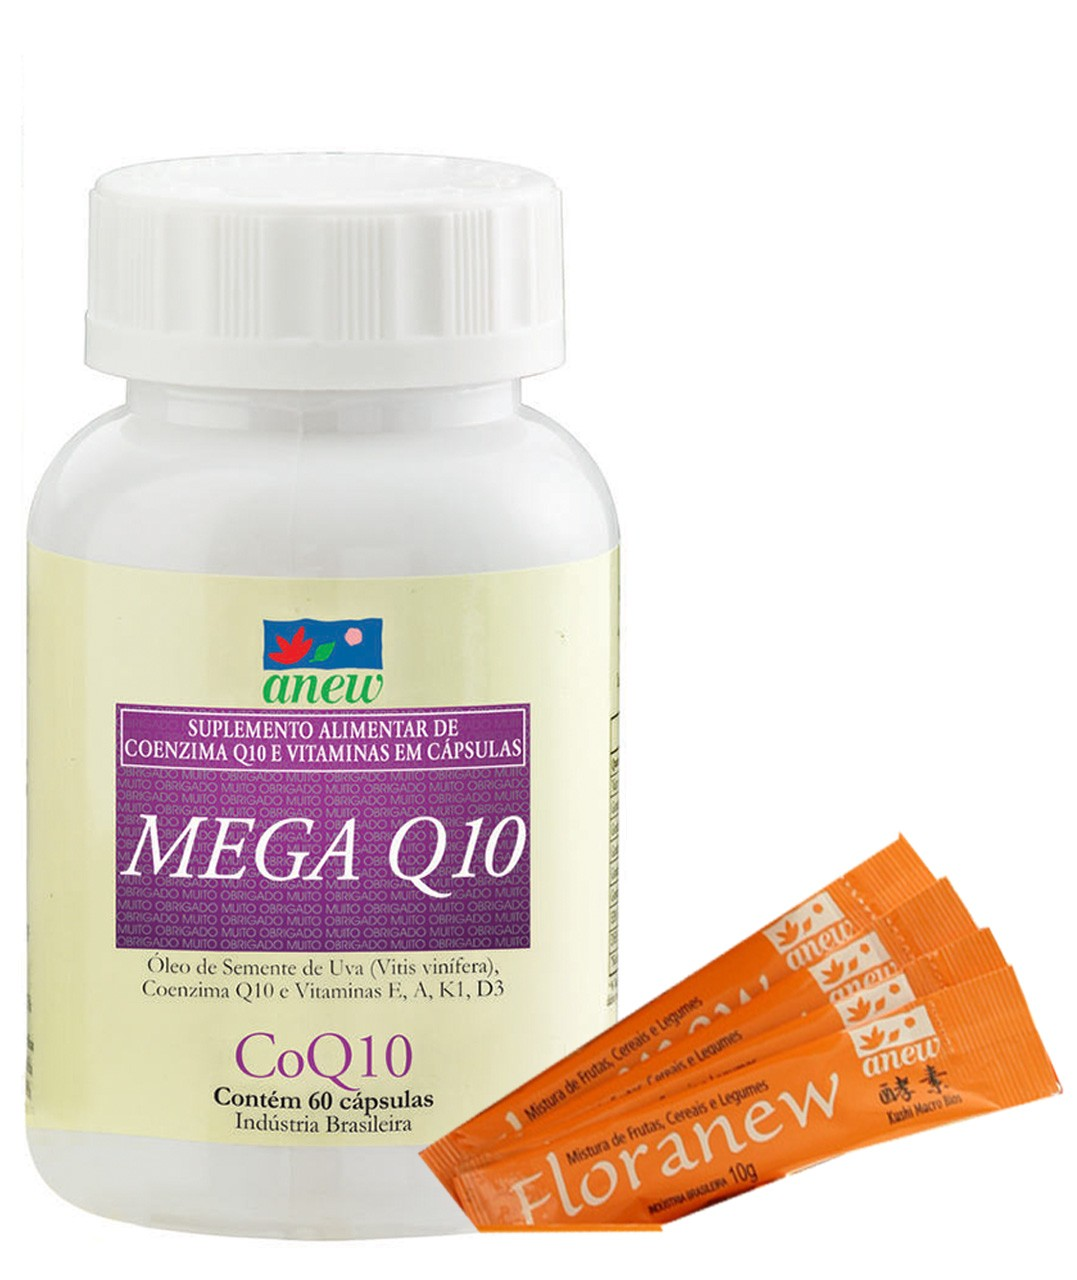 Mega Q10 60 Caps + Floranew (4 Amostras Grátis)